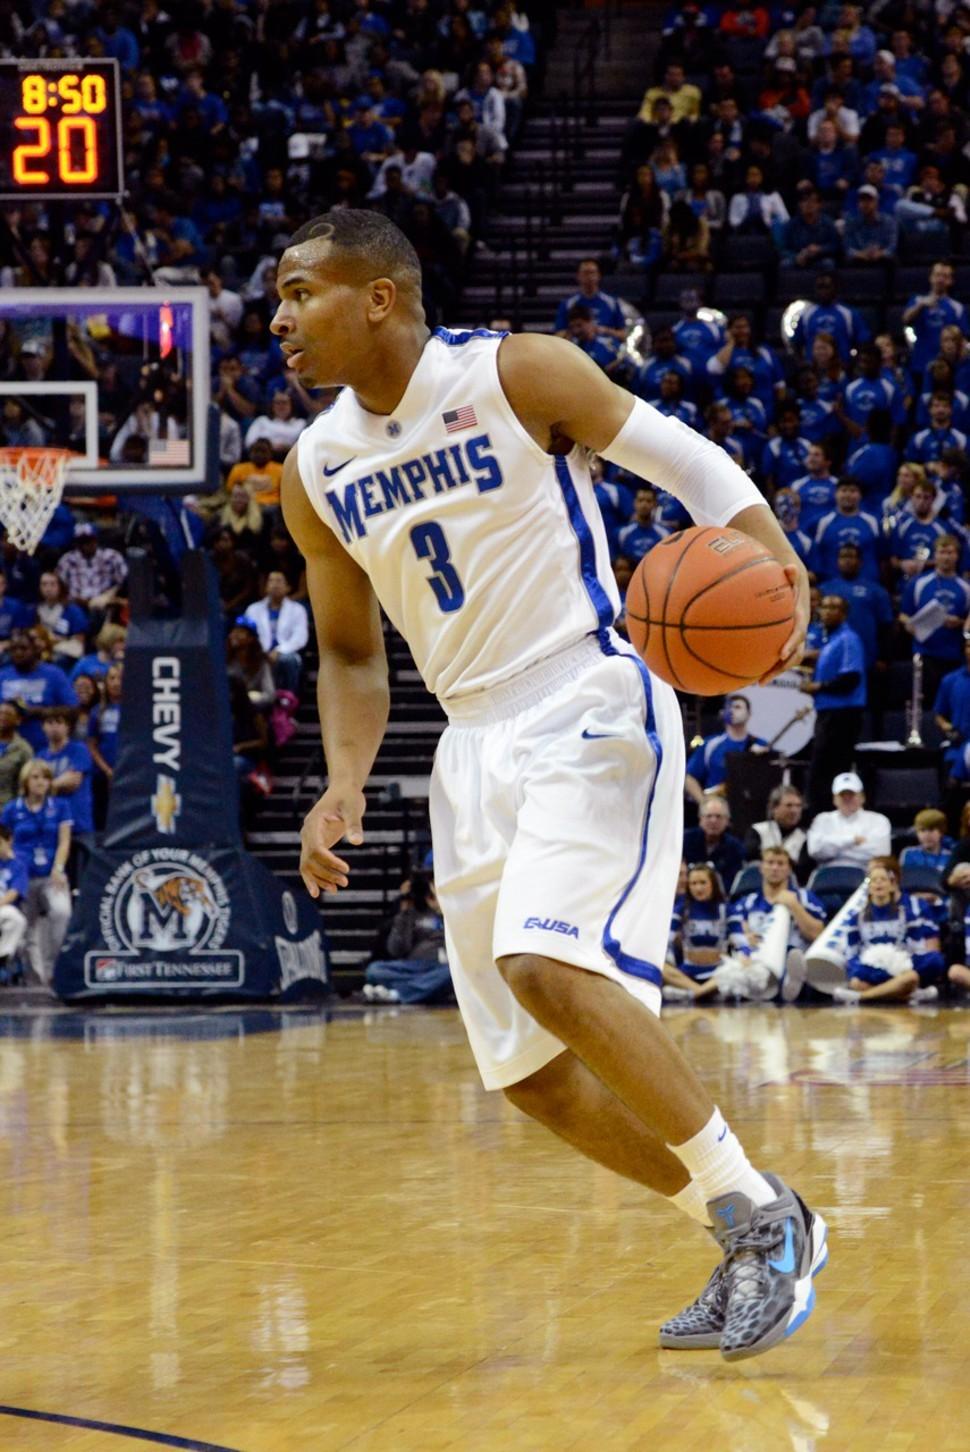 Crawford